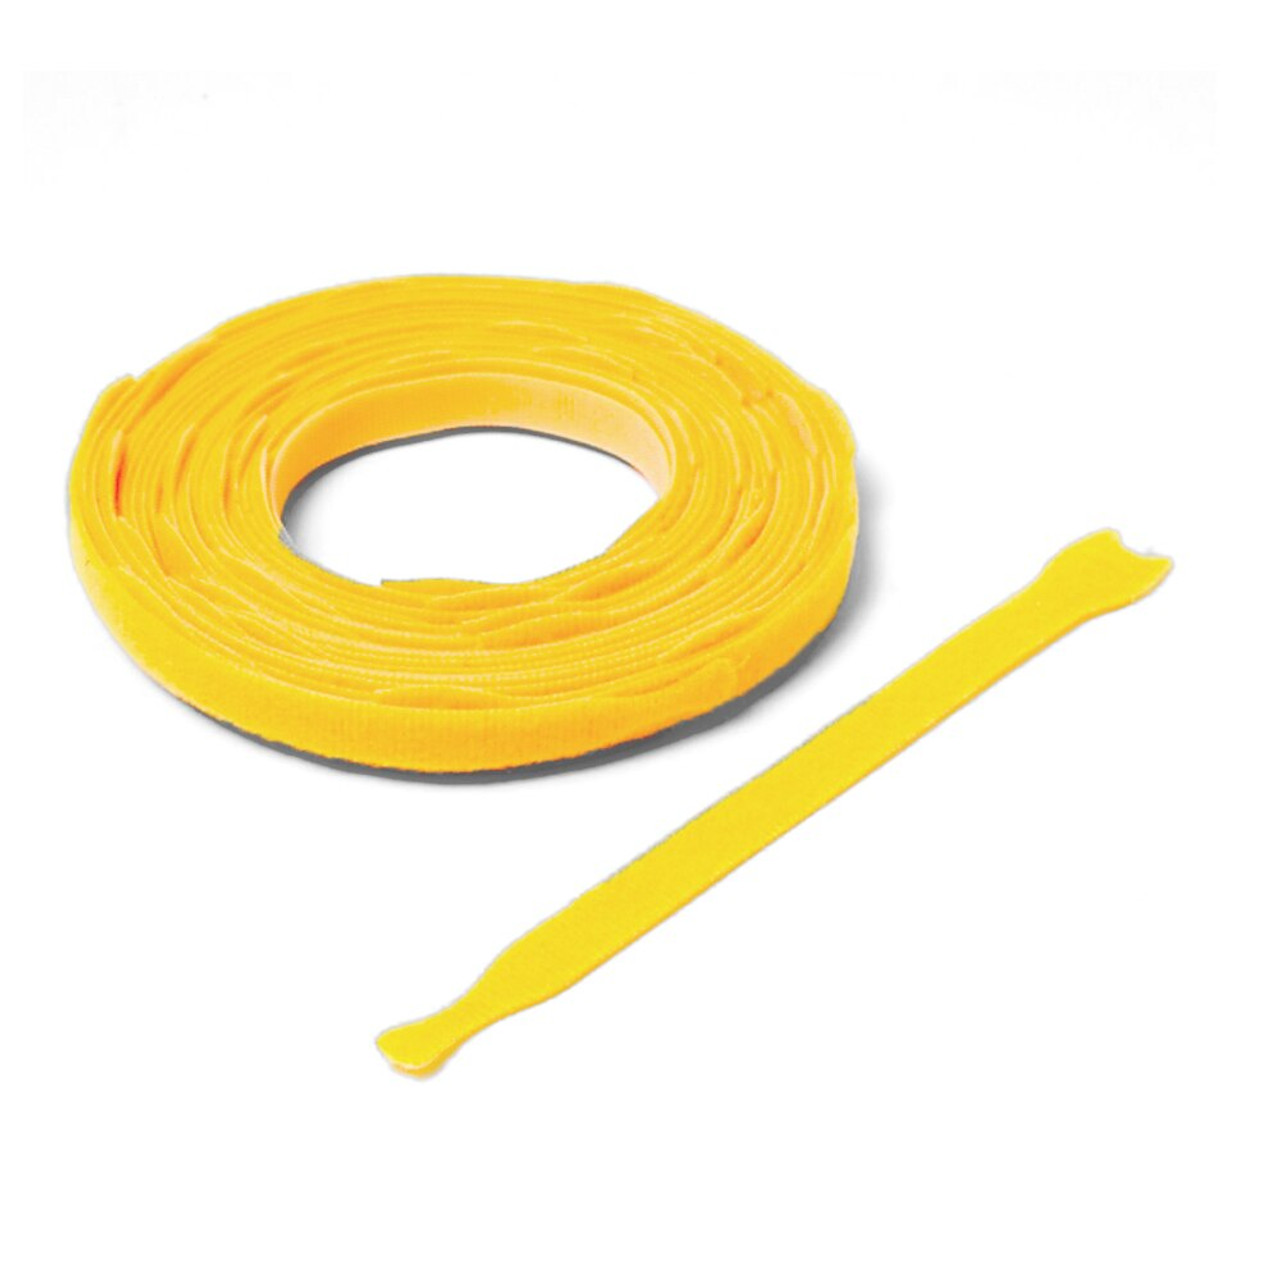 VELCRO ® Brand ONE-WRAP® Die-Cut Straps - Yellow